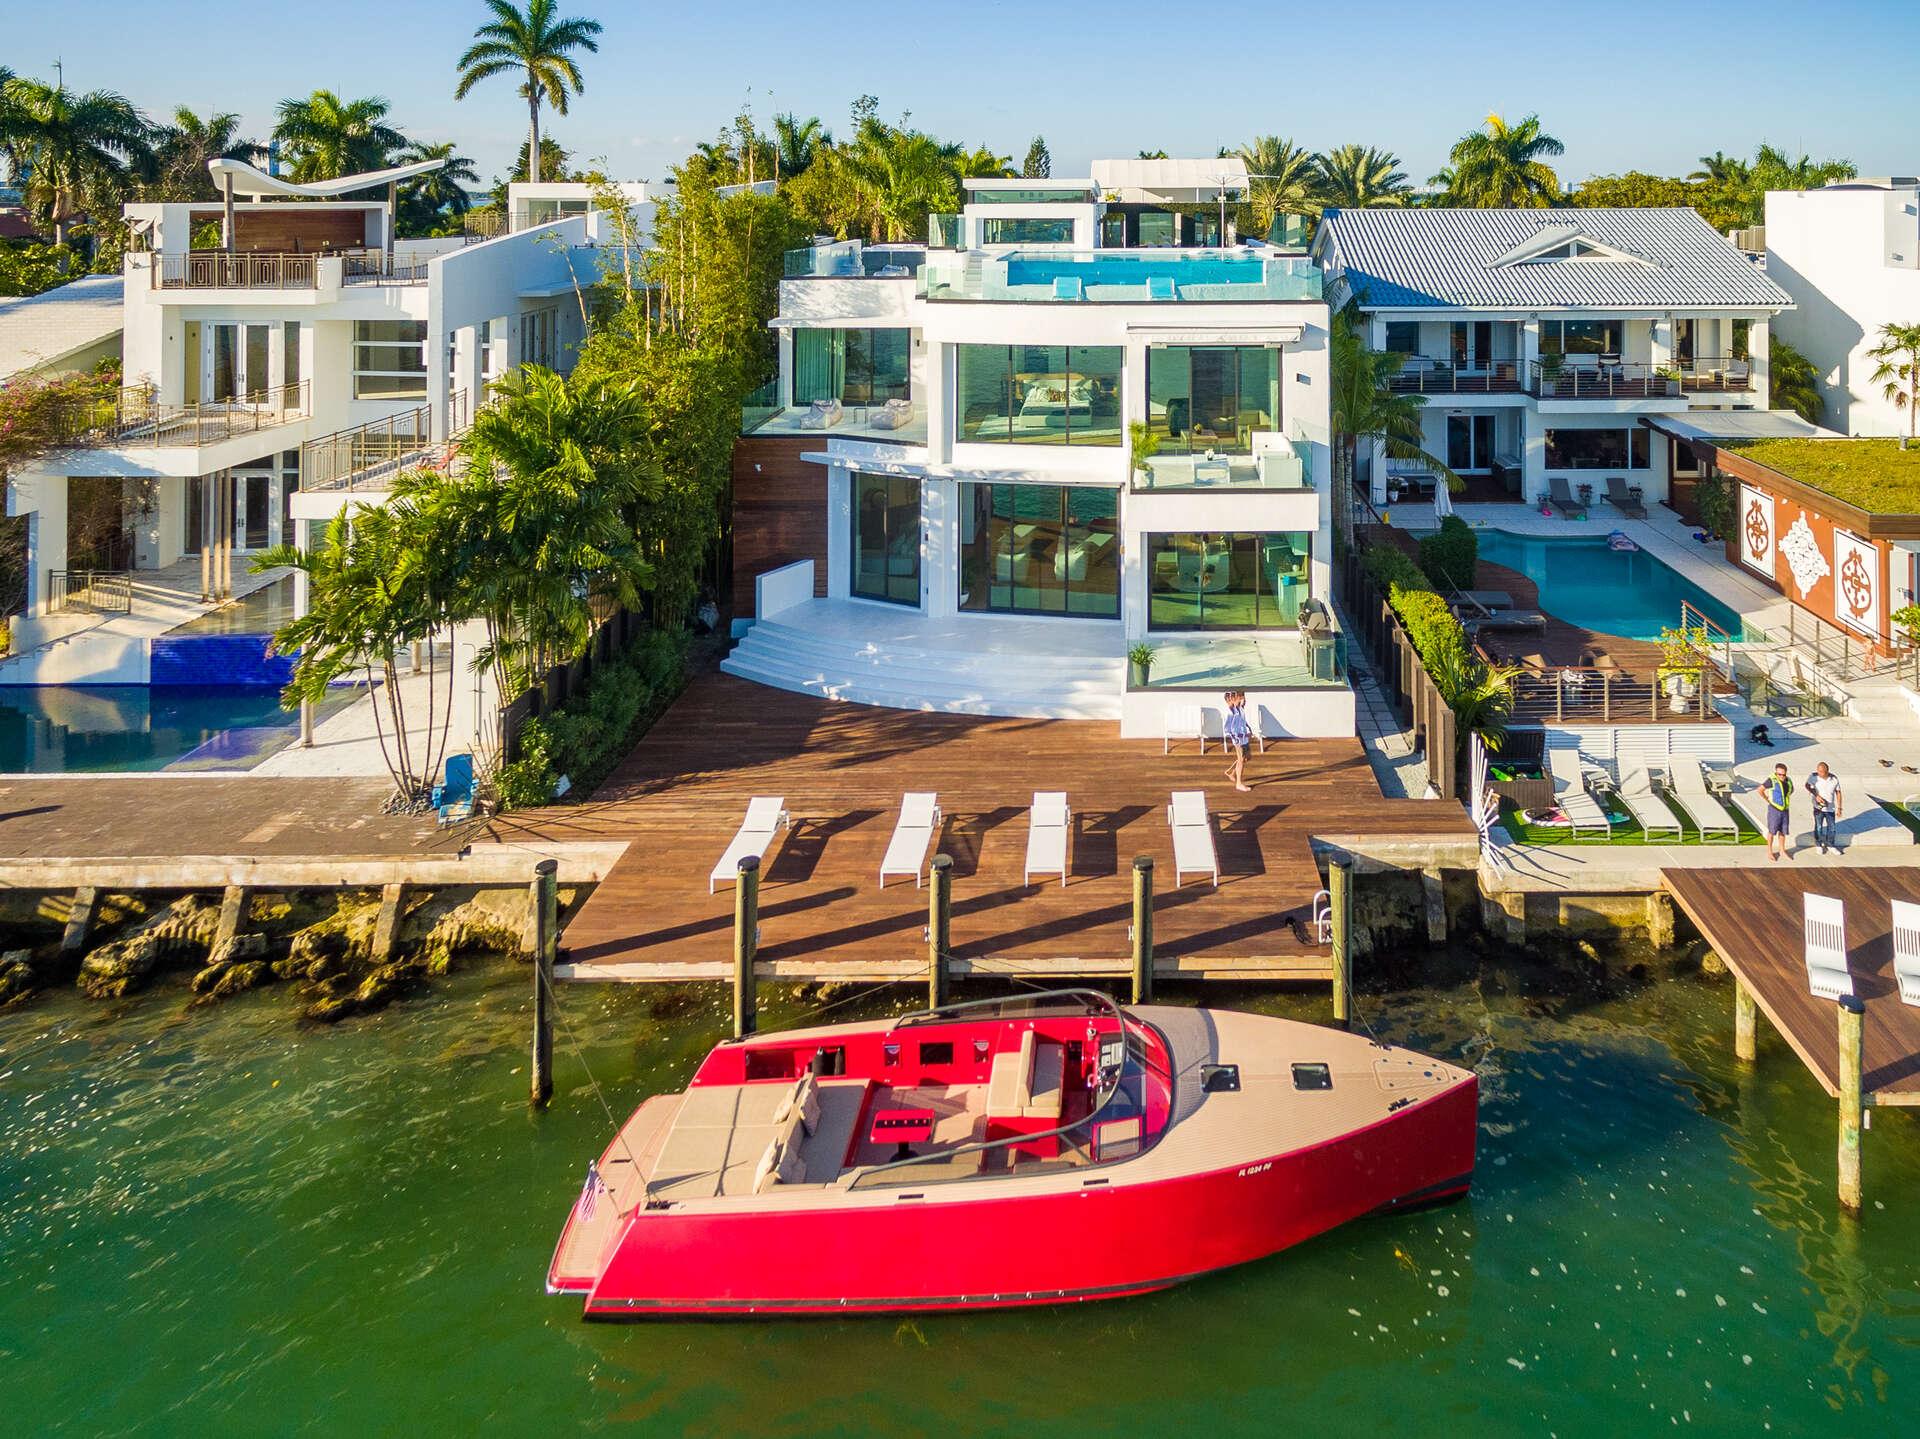 Luxury vacation rentals usa - Florida - Miami beach - Venetian islands - Villa Savant - Image 1/40